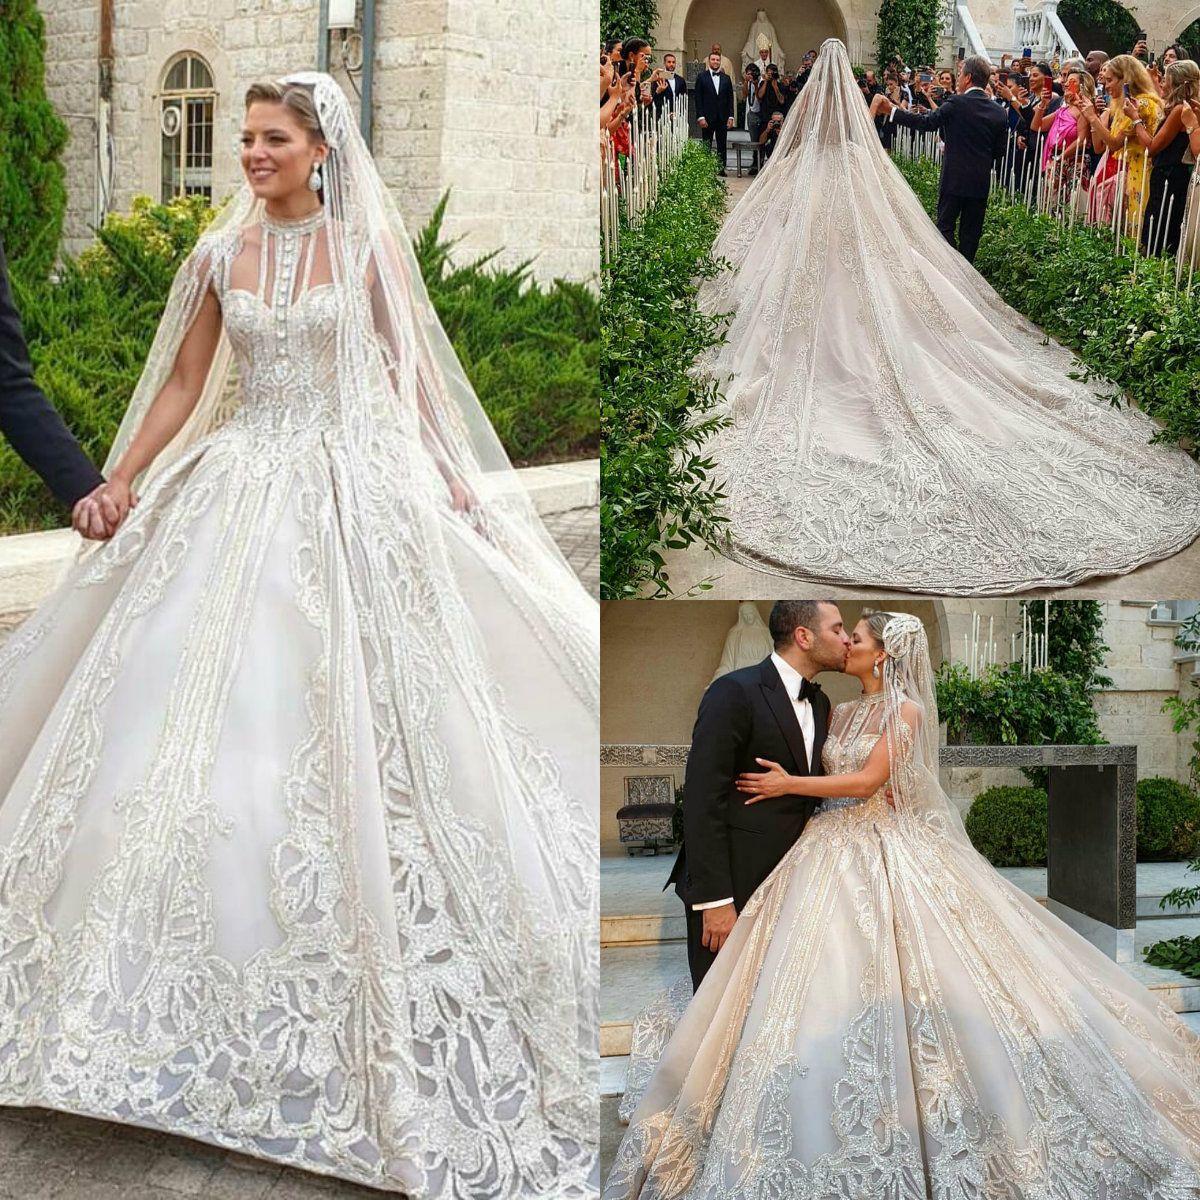 2020 Luxury Elie Saab Ball Gown Wedding Dresses Lace Beaded Monarch Train Vintage Dubai Wedding Dress Plus Size Arabic Bridal Gowns